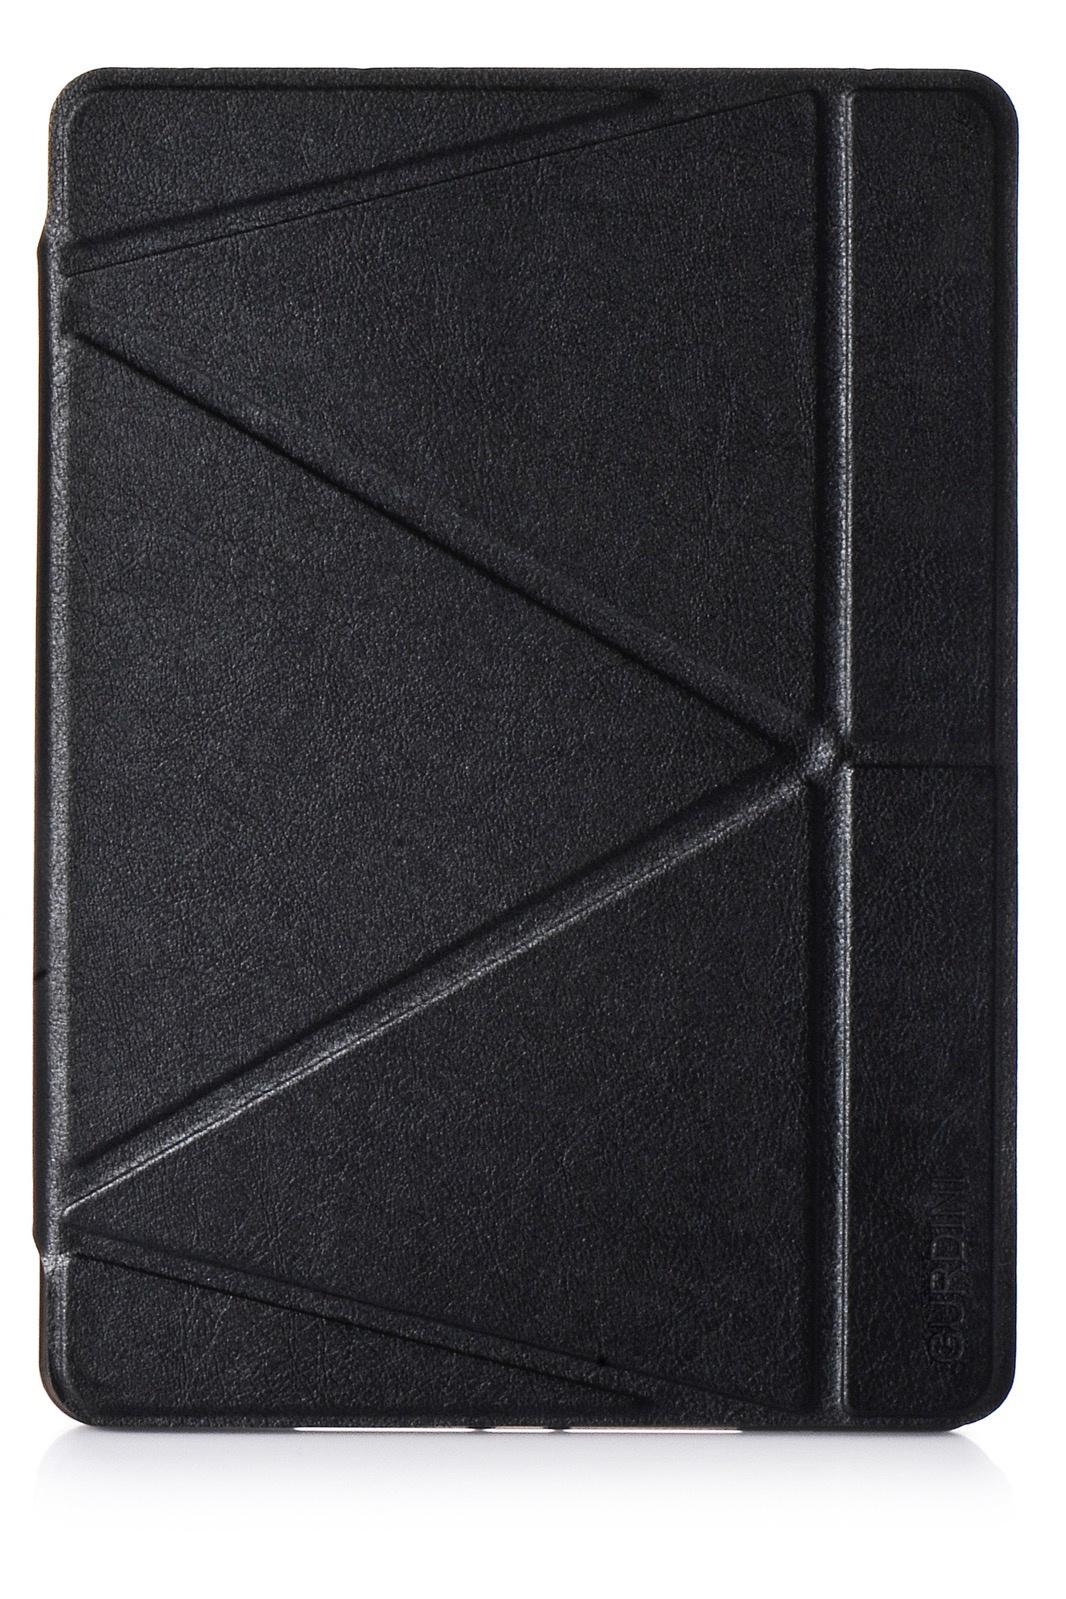 Чехол для планшета Gurdini Lights Series для Apple iPad Air 2, 660033, черный